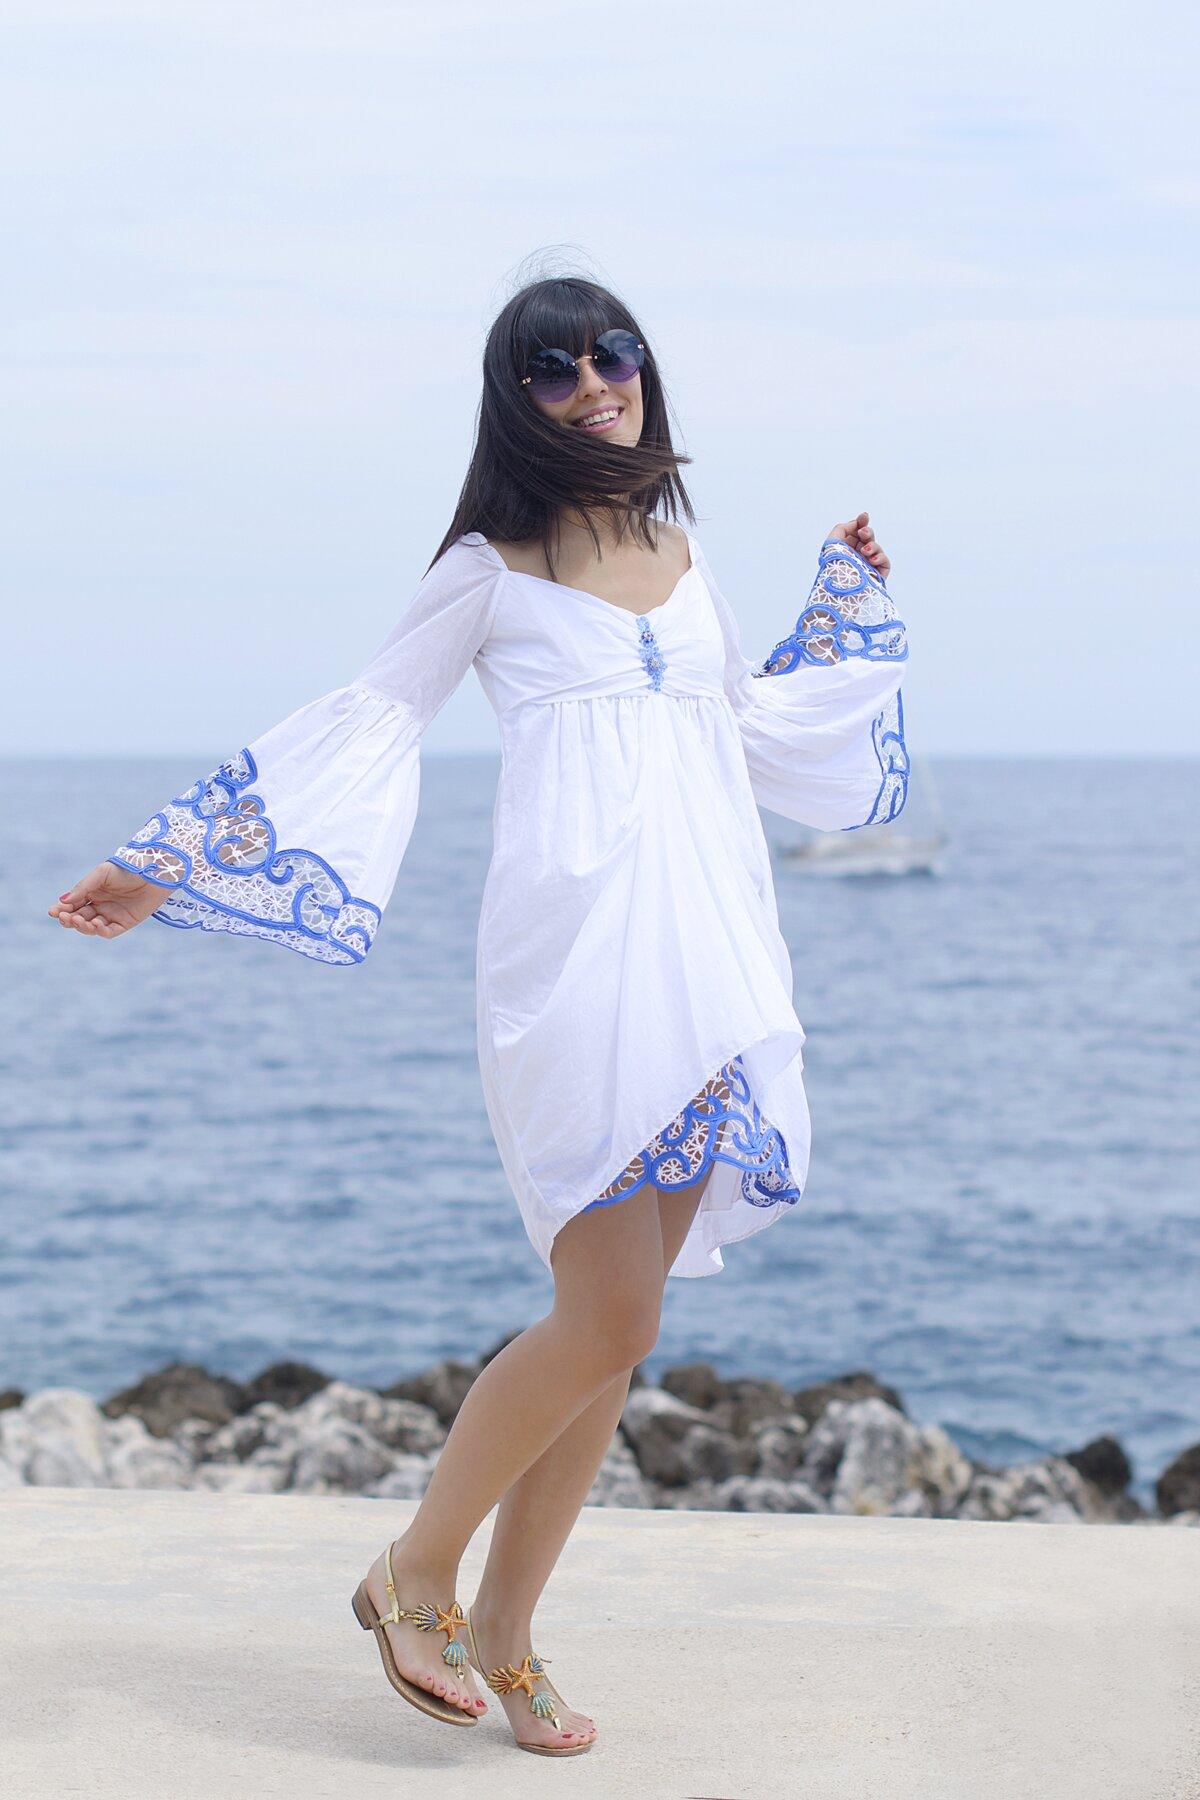 Gioiello 6vgiyfy7b Sandali Biancoamp; Outfit Da Marekaftano nXwP80Ok